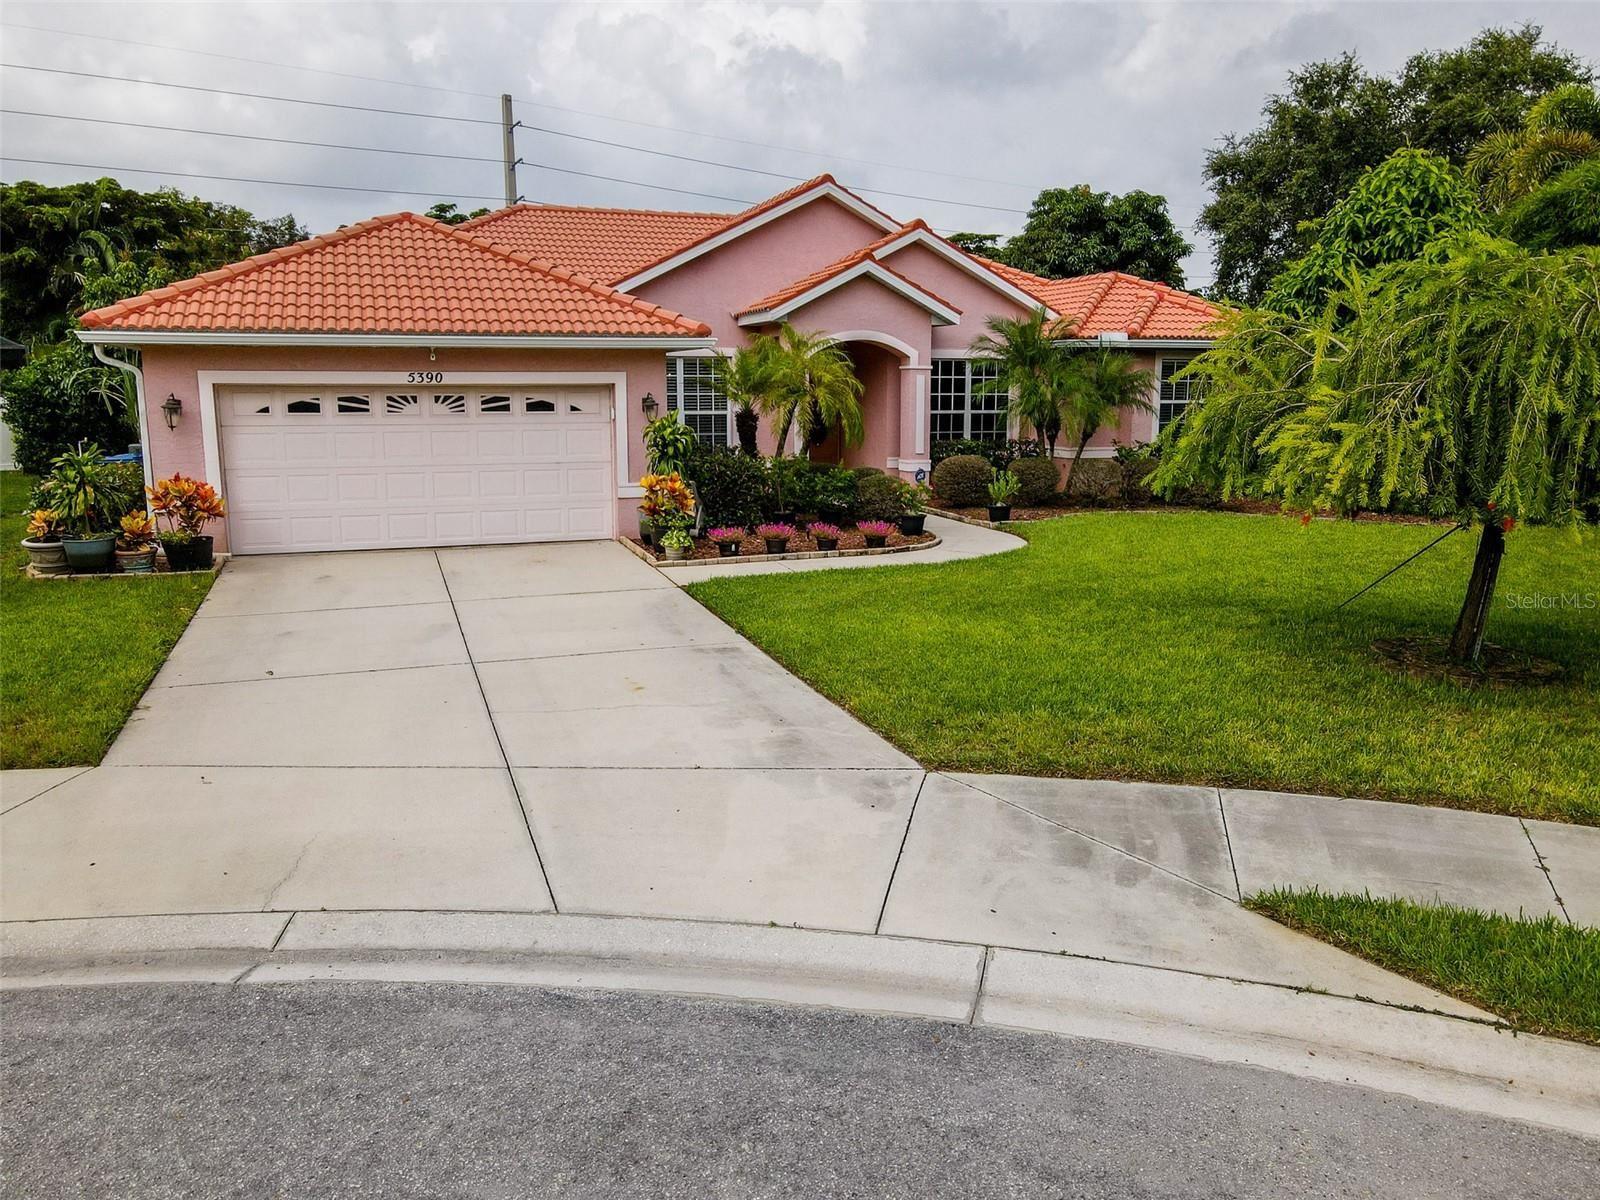 Photo of 5390 ANTHONY LANE, SARASOTA, FL 34233 (MLS # A4510528)